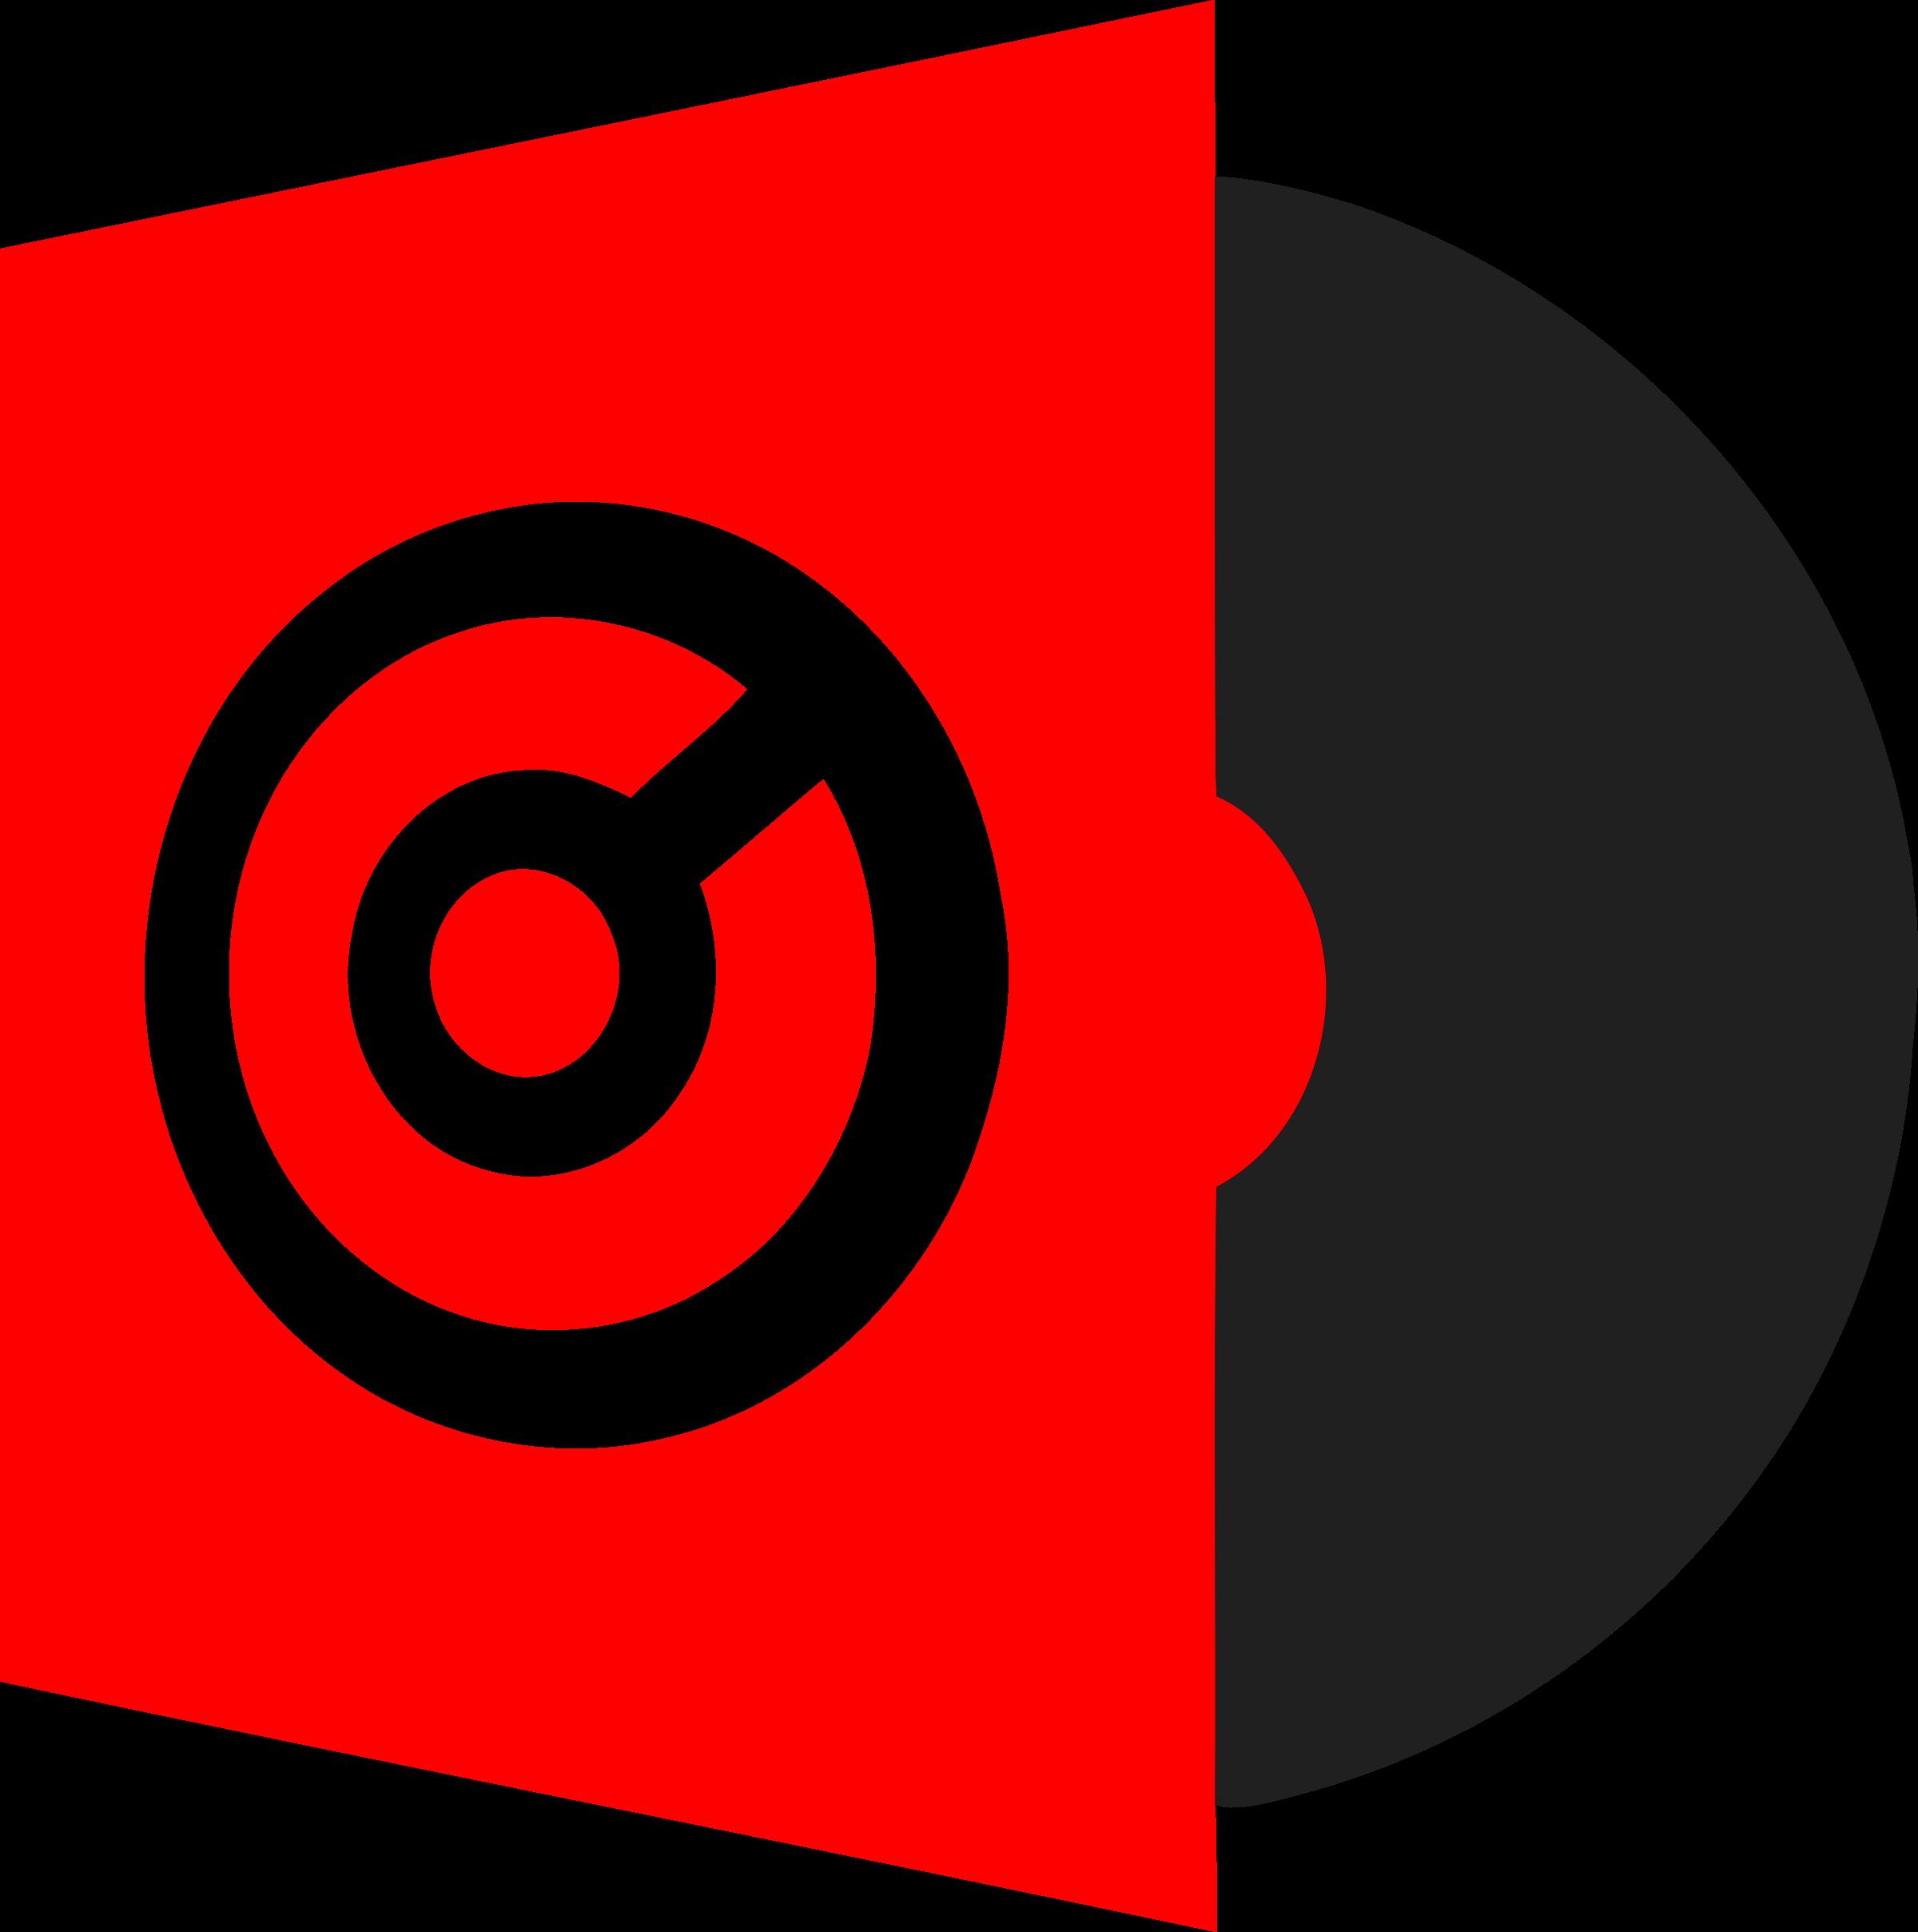 Virtual png transparent svg. Dj clipart dj logo